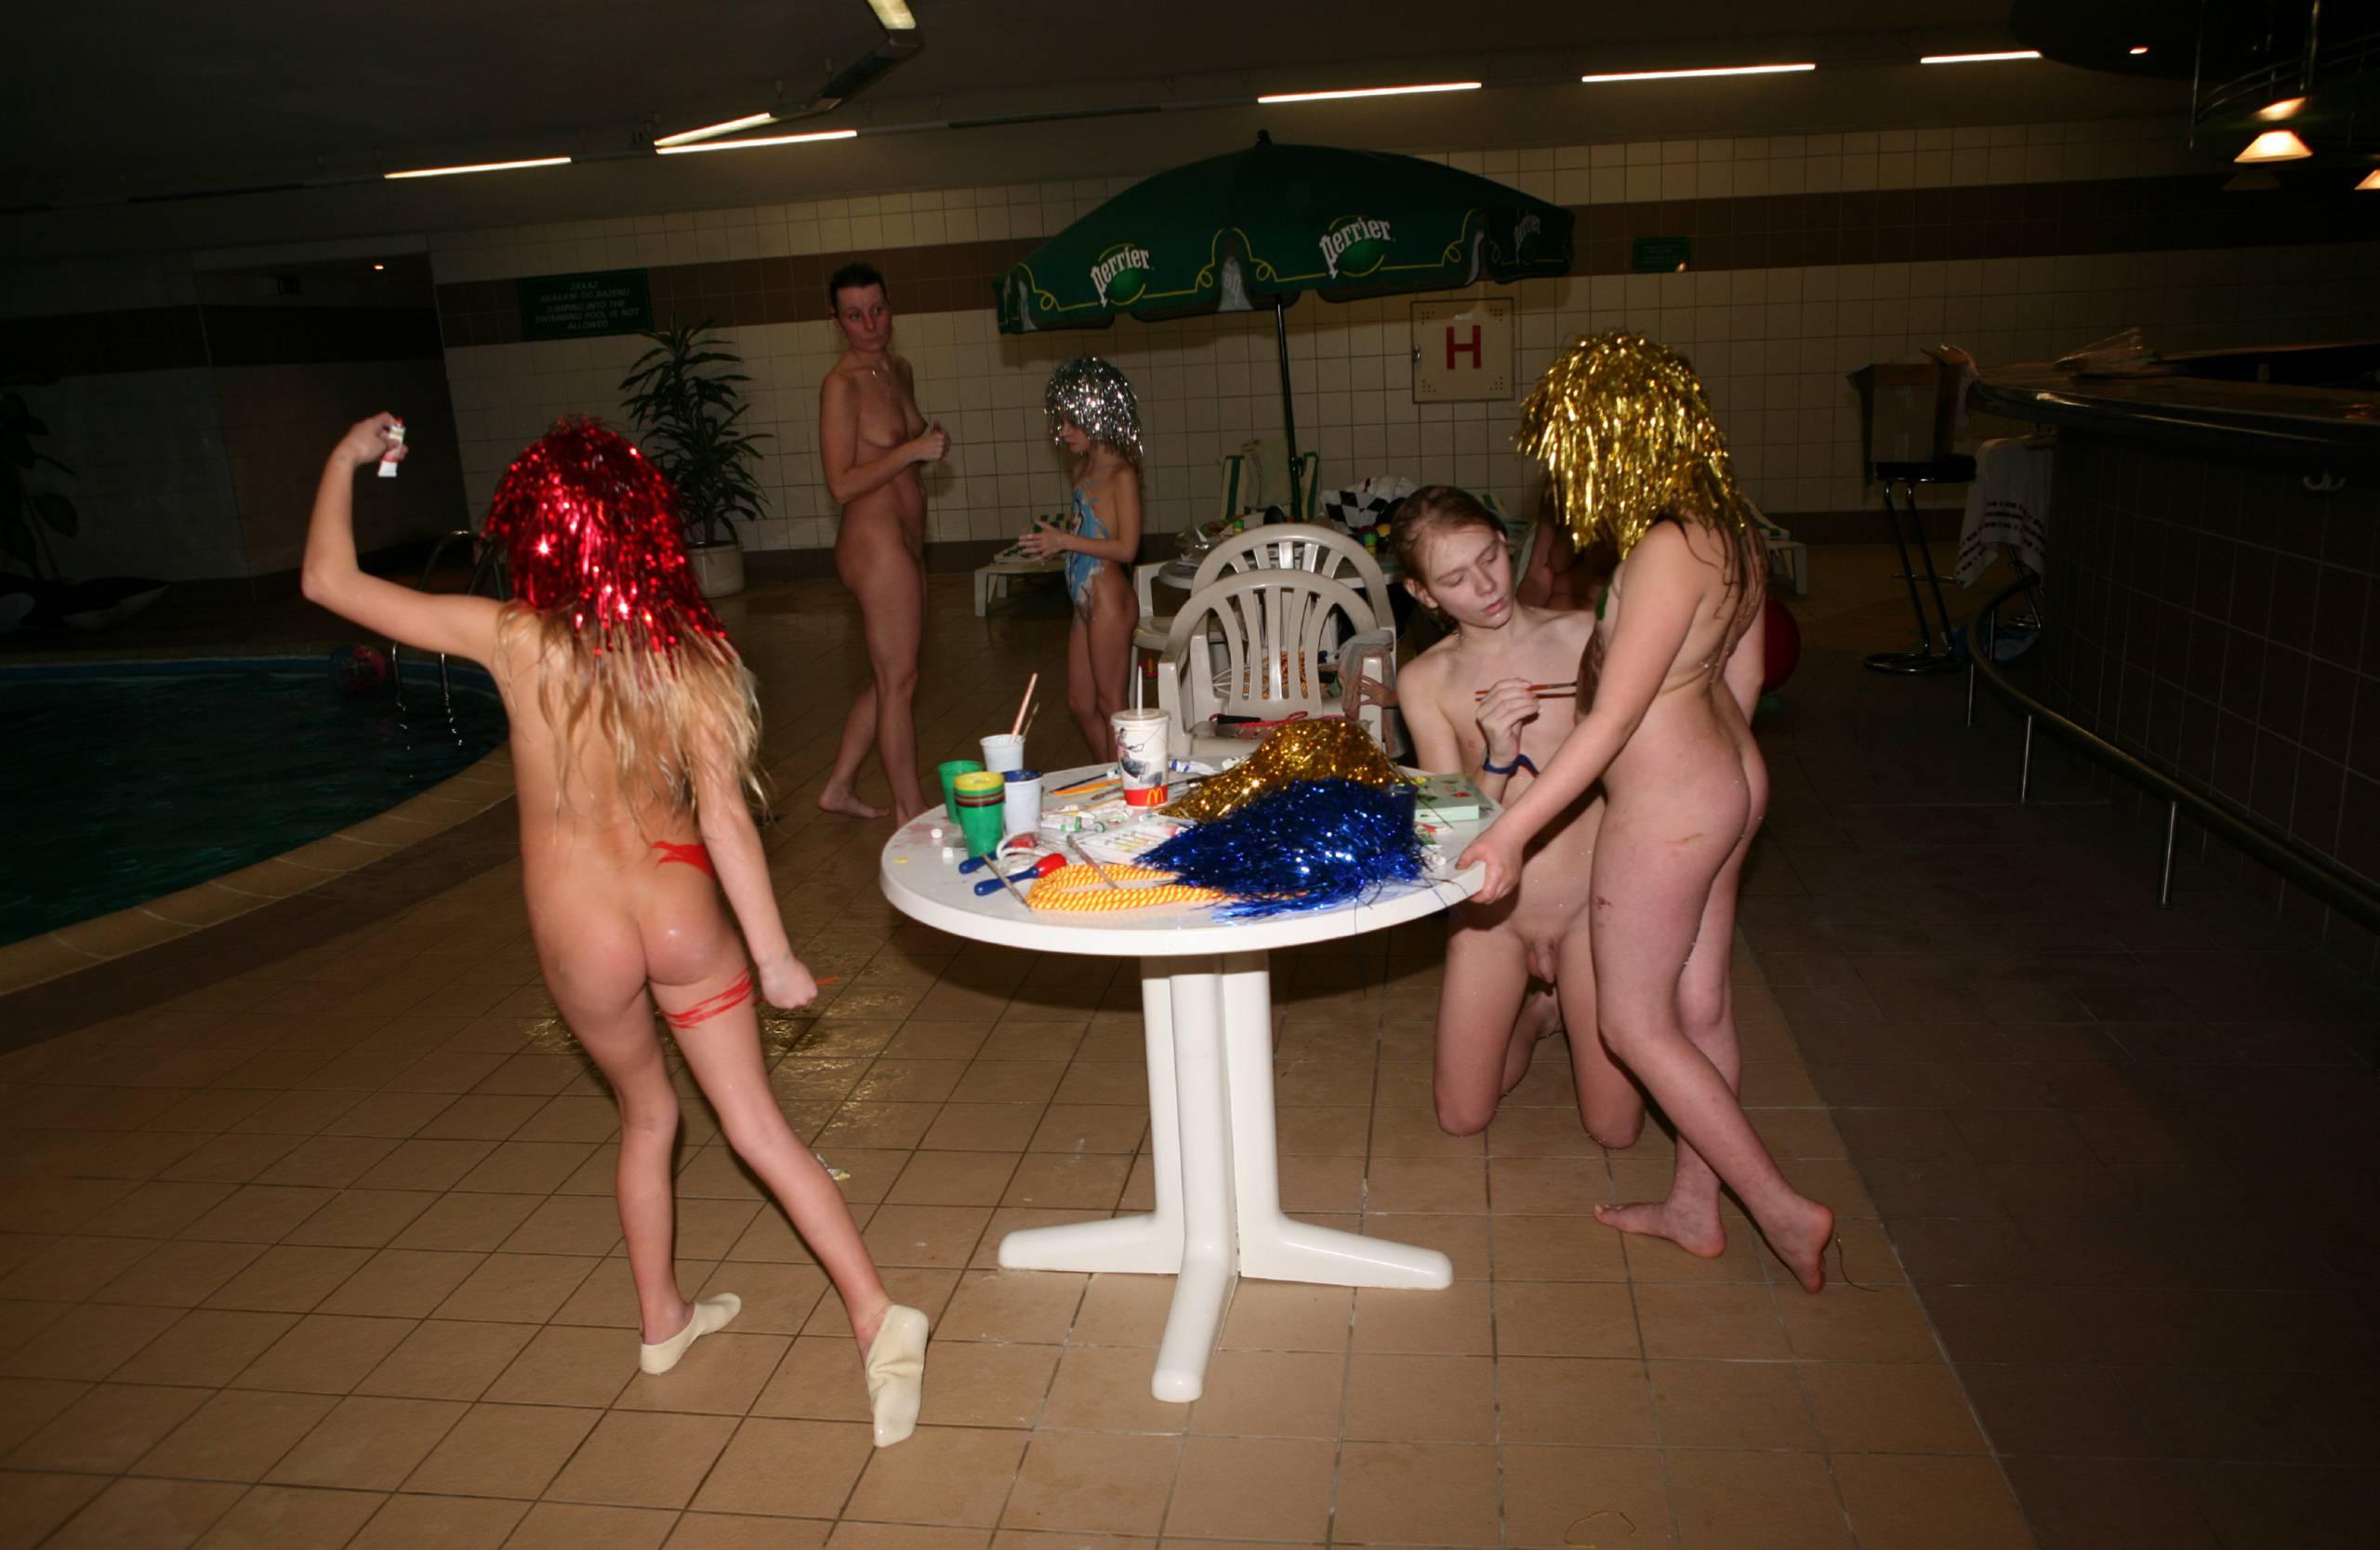 Nudist Gallery 2010 Gym and Sauna - 1